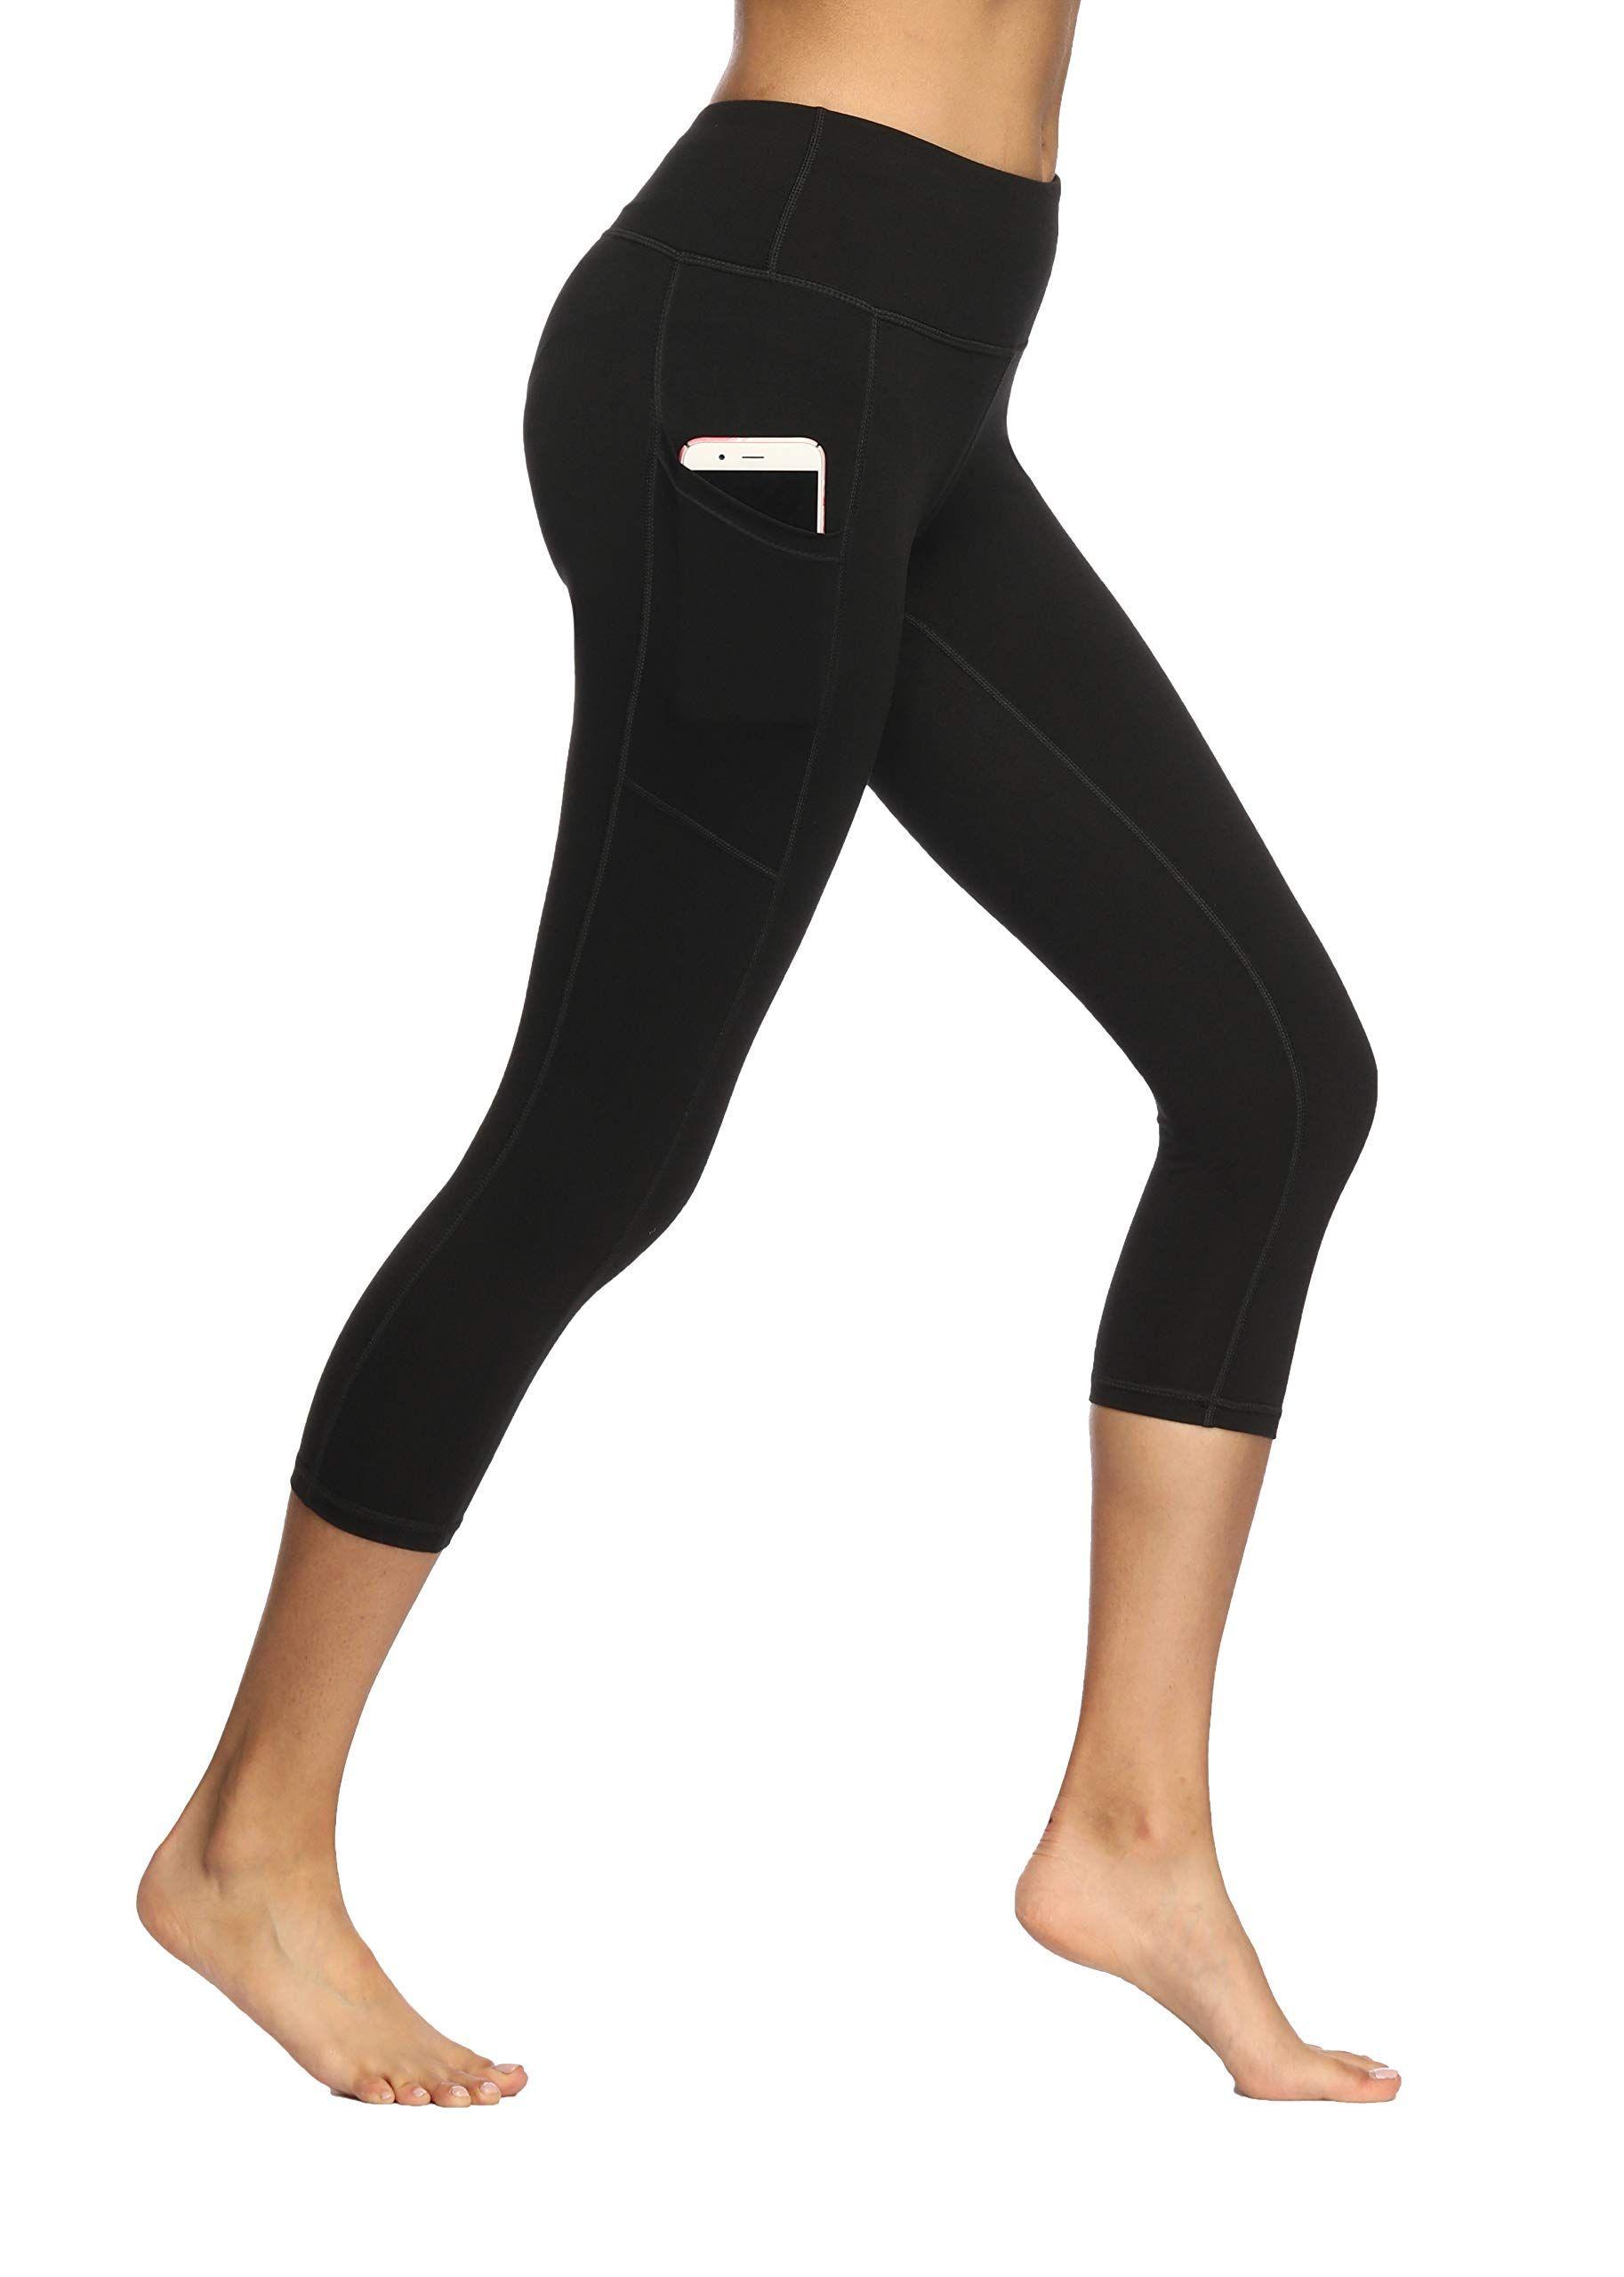 Pocket Yoga Pants Tummy Control Workout Running 4 Fengbay High Waist Yoga Pants